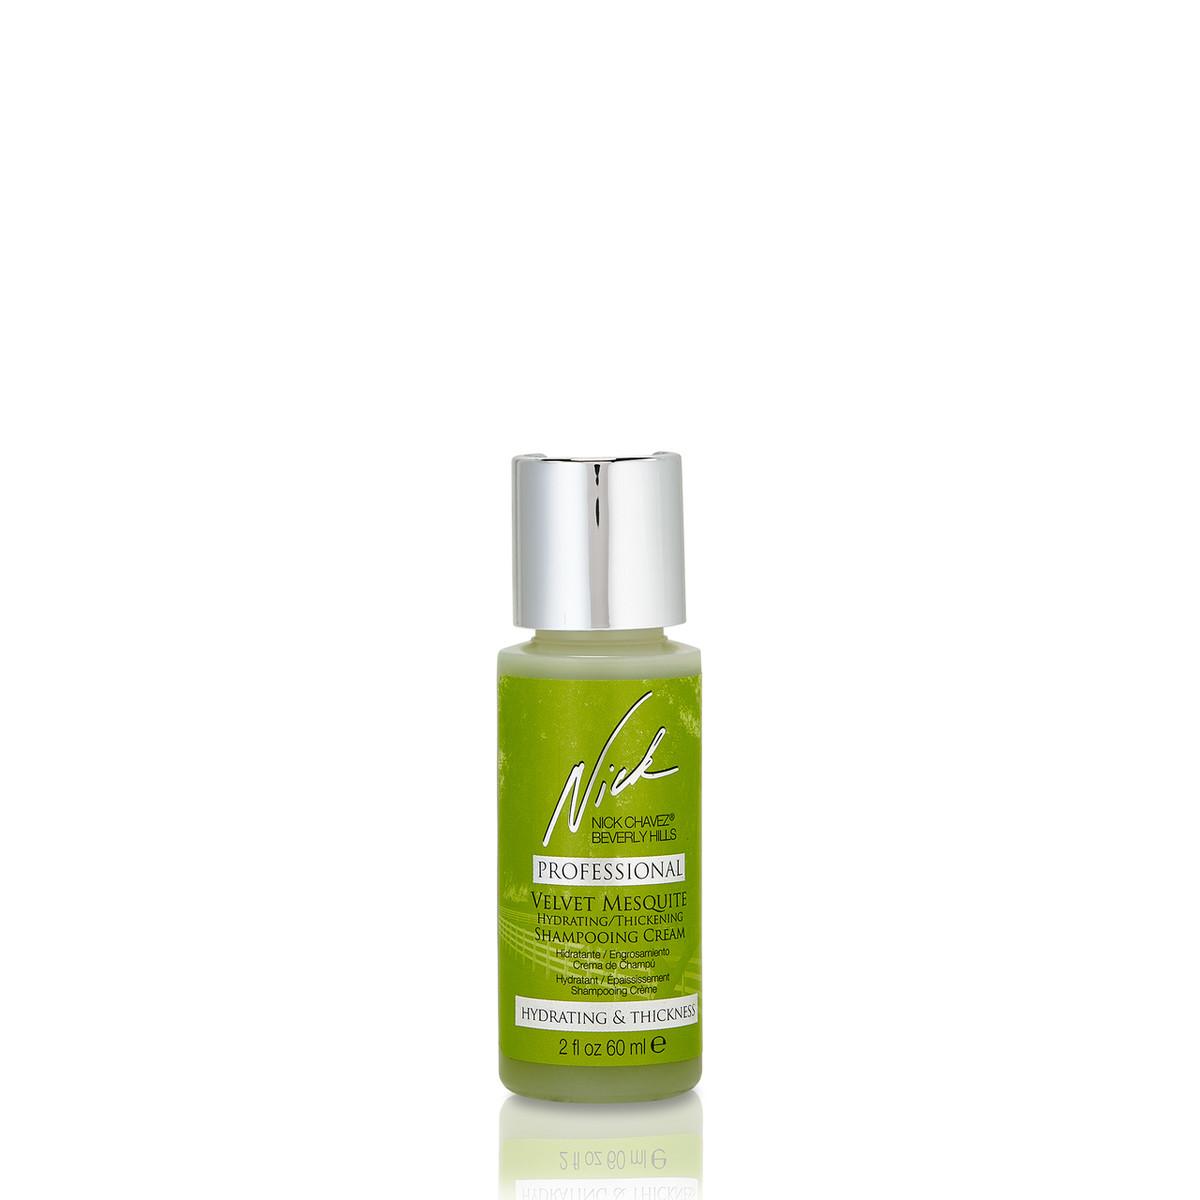 2oz Velvet Mesquite Hydrating Thickening Shampooing Creme